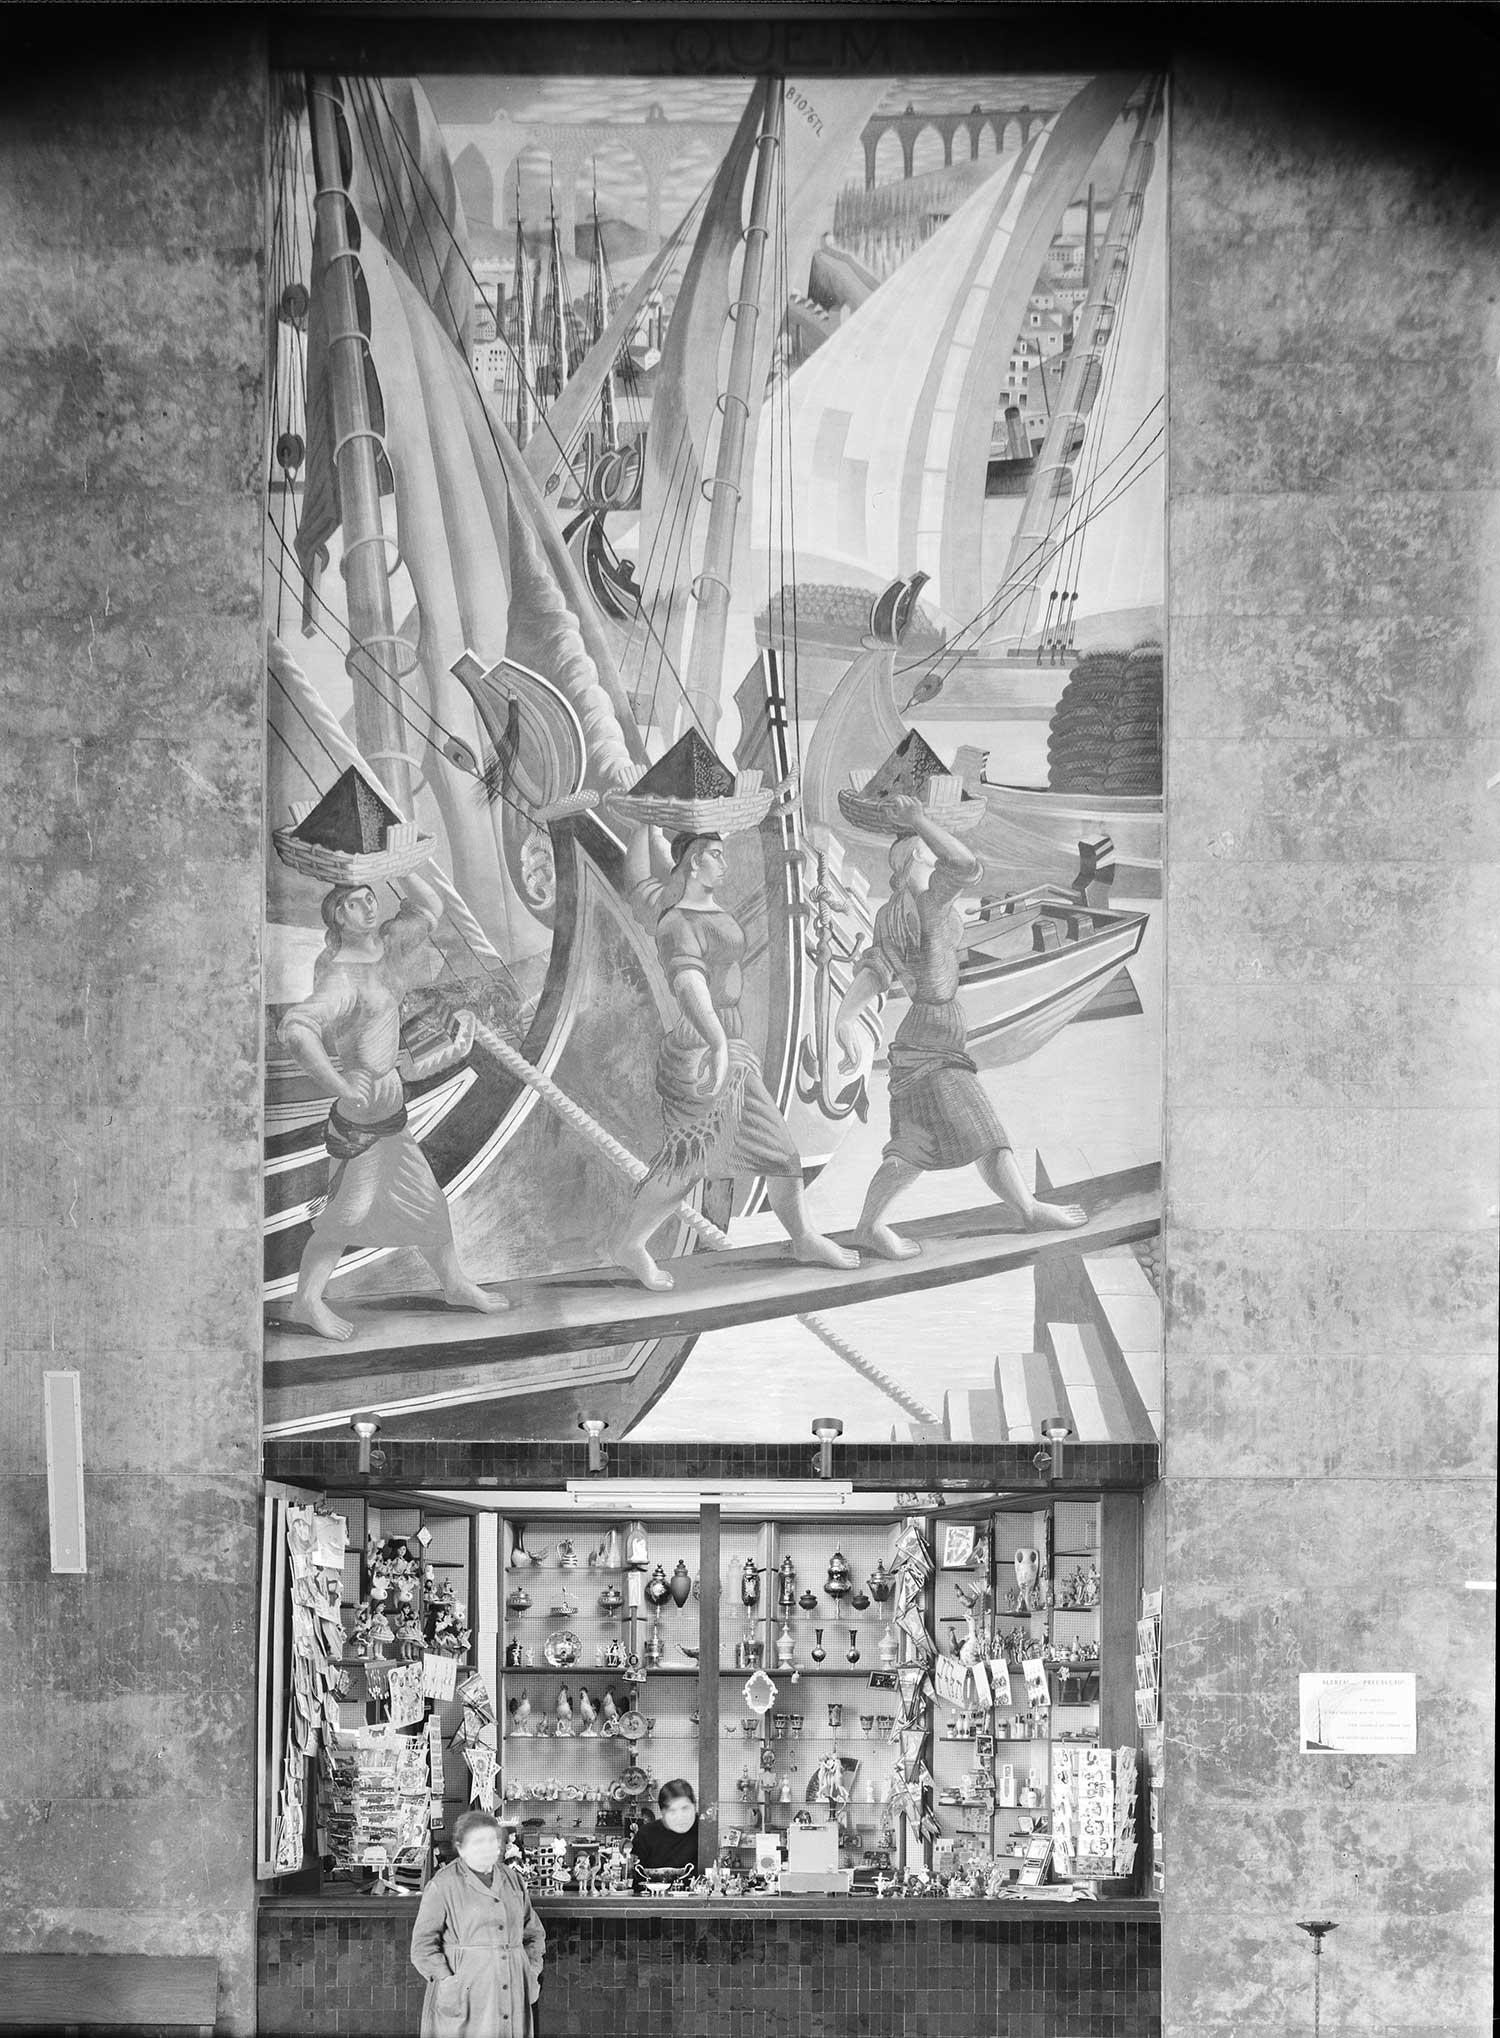 Gare Marítima de Alcântara, Lisbon Artist: José de Almada Negreiros  Photo: Mário Novais, ca. 1943-1945, Lisbon  [CFT003_033114]